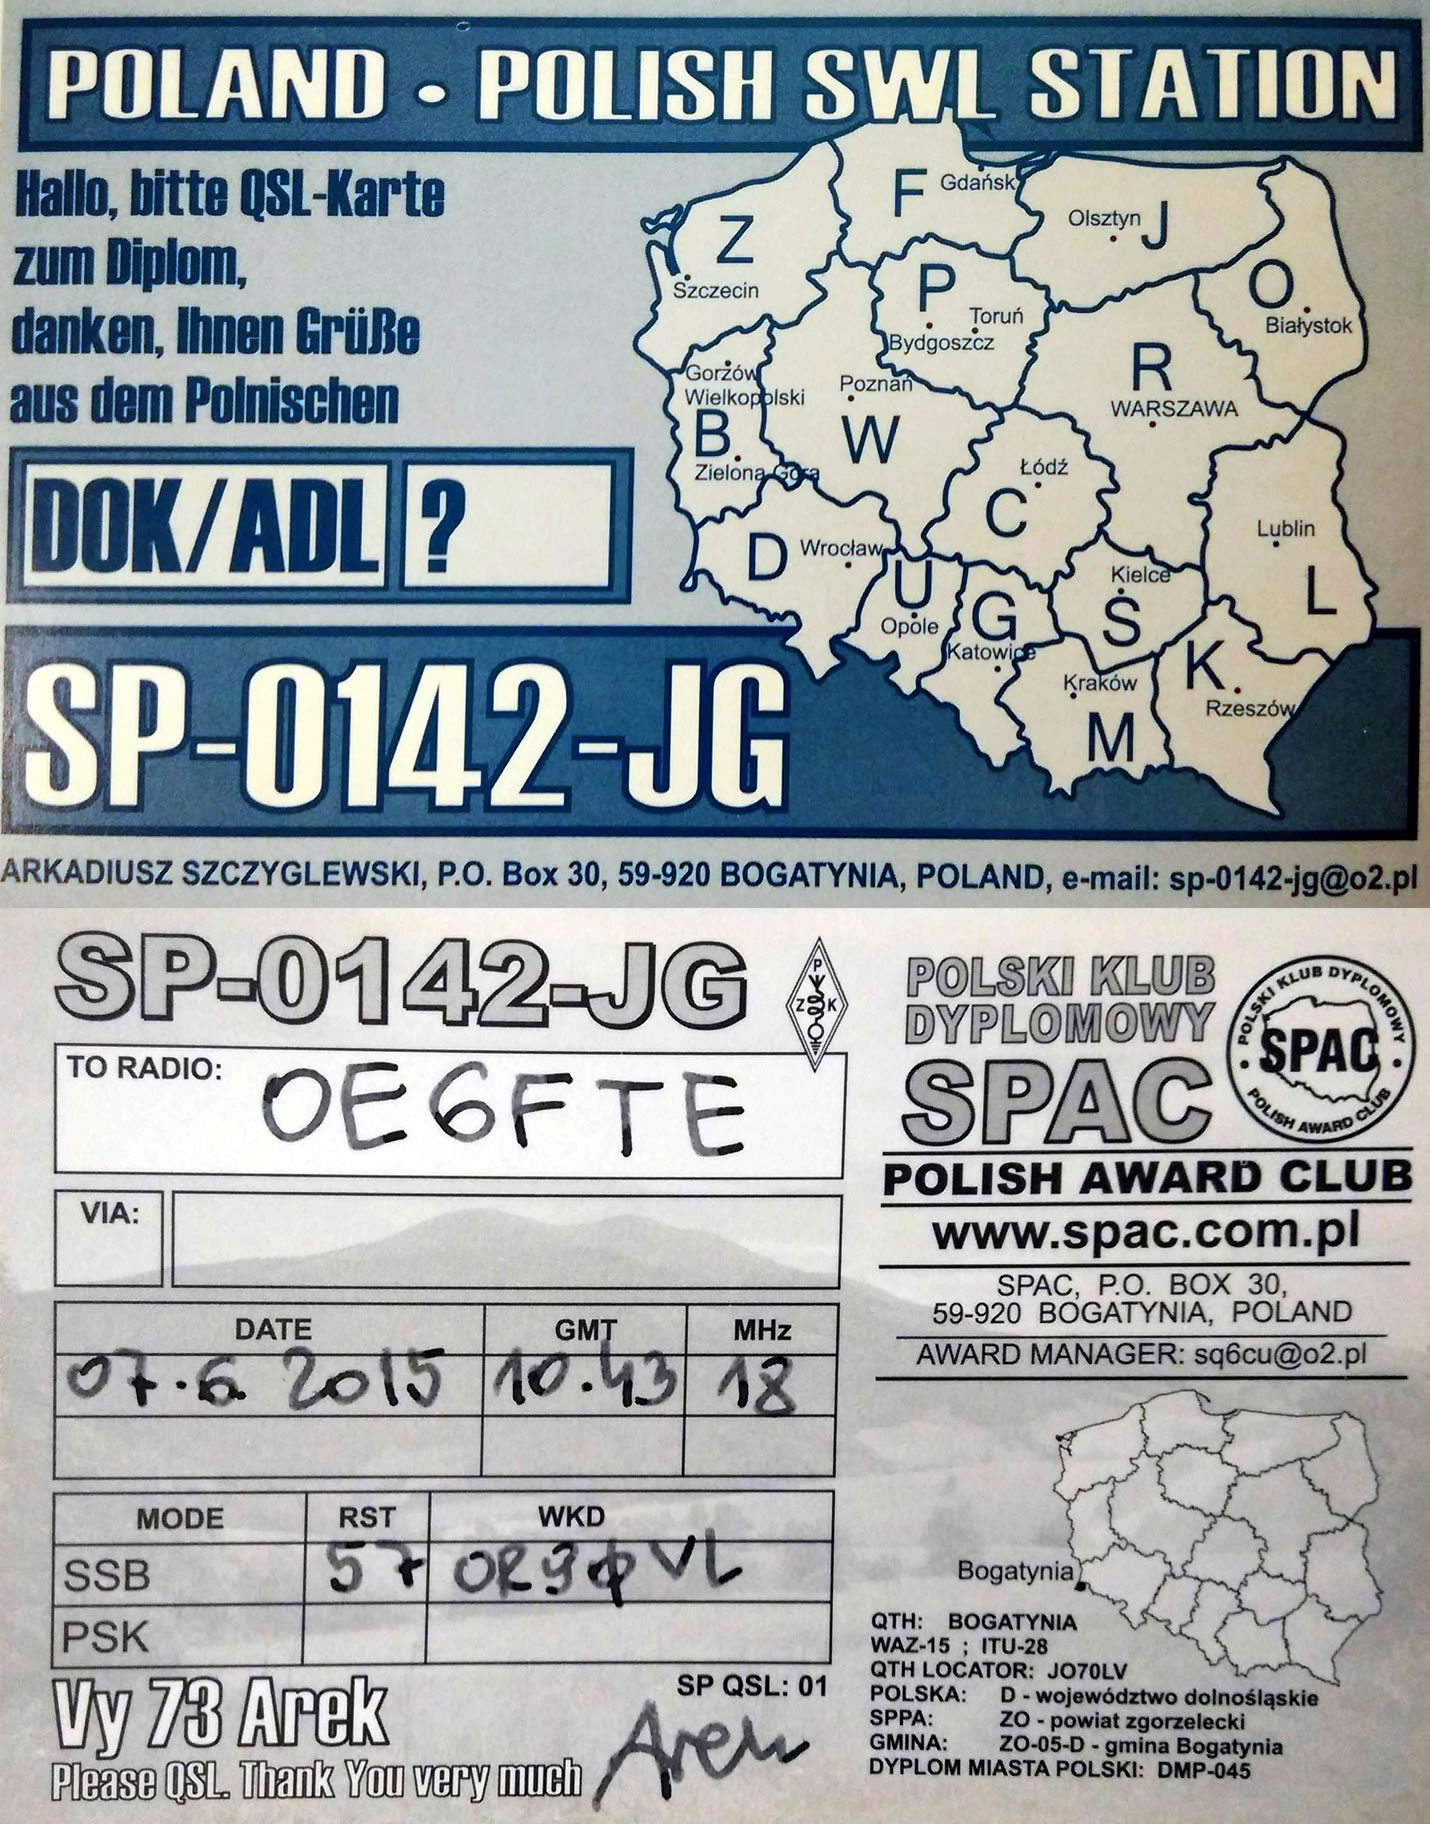 SP-0142-JG